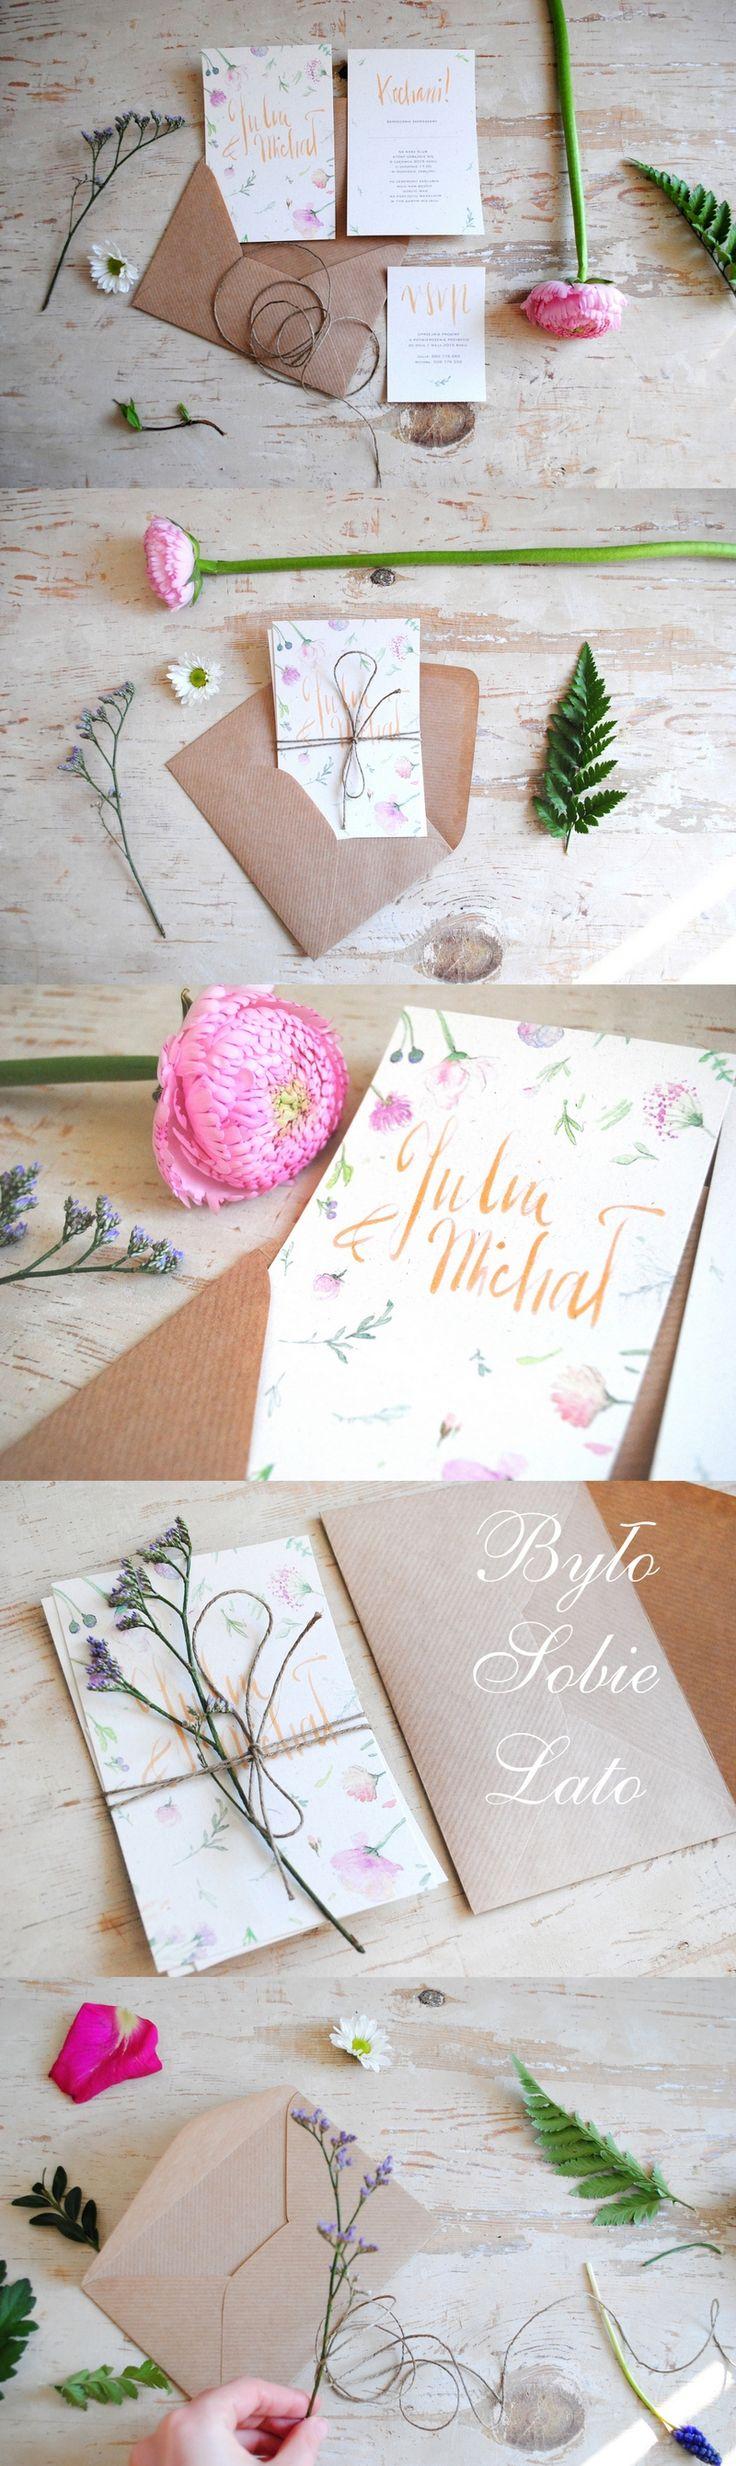 summer wedding invitations with calligraphy #weddinginvitations